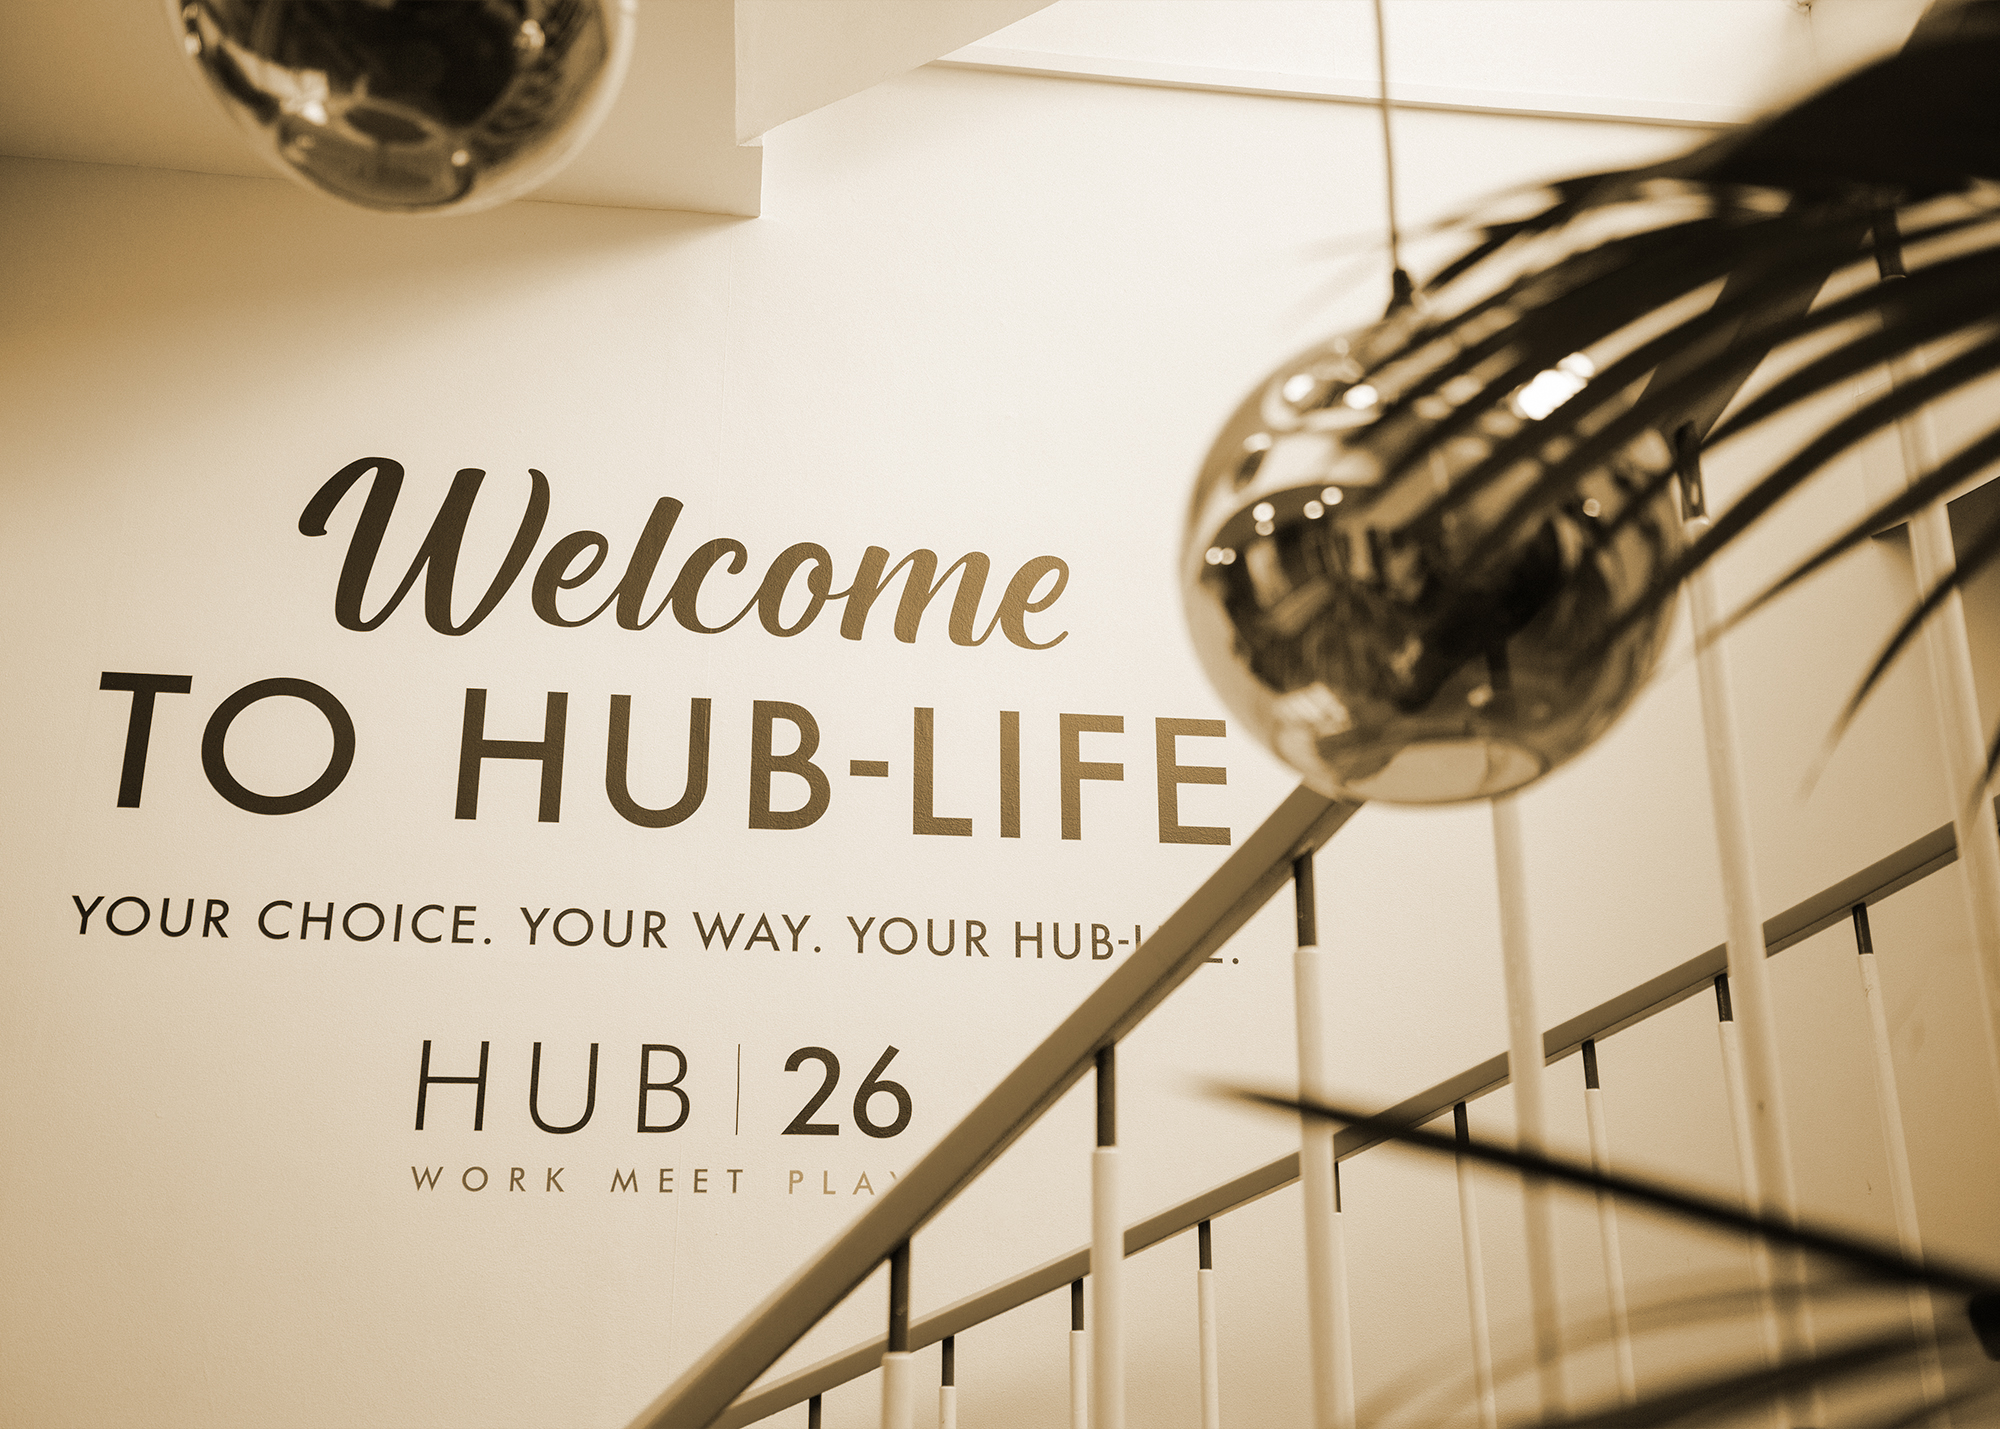 hub26 meet - club26 memberships bronze